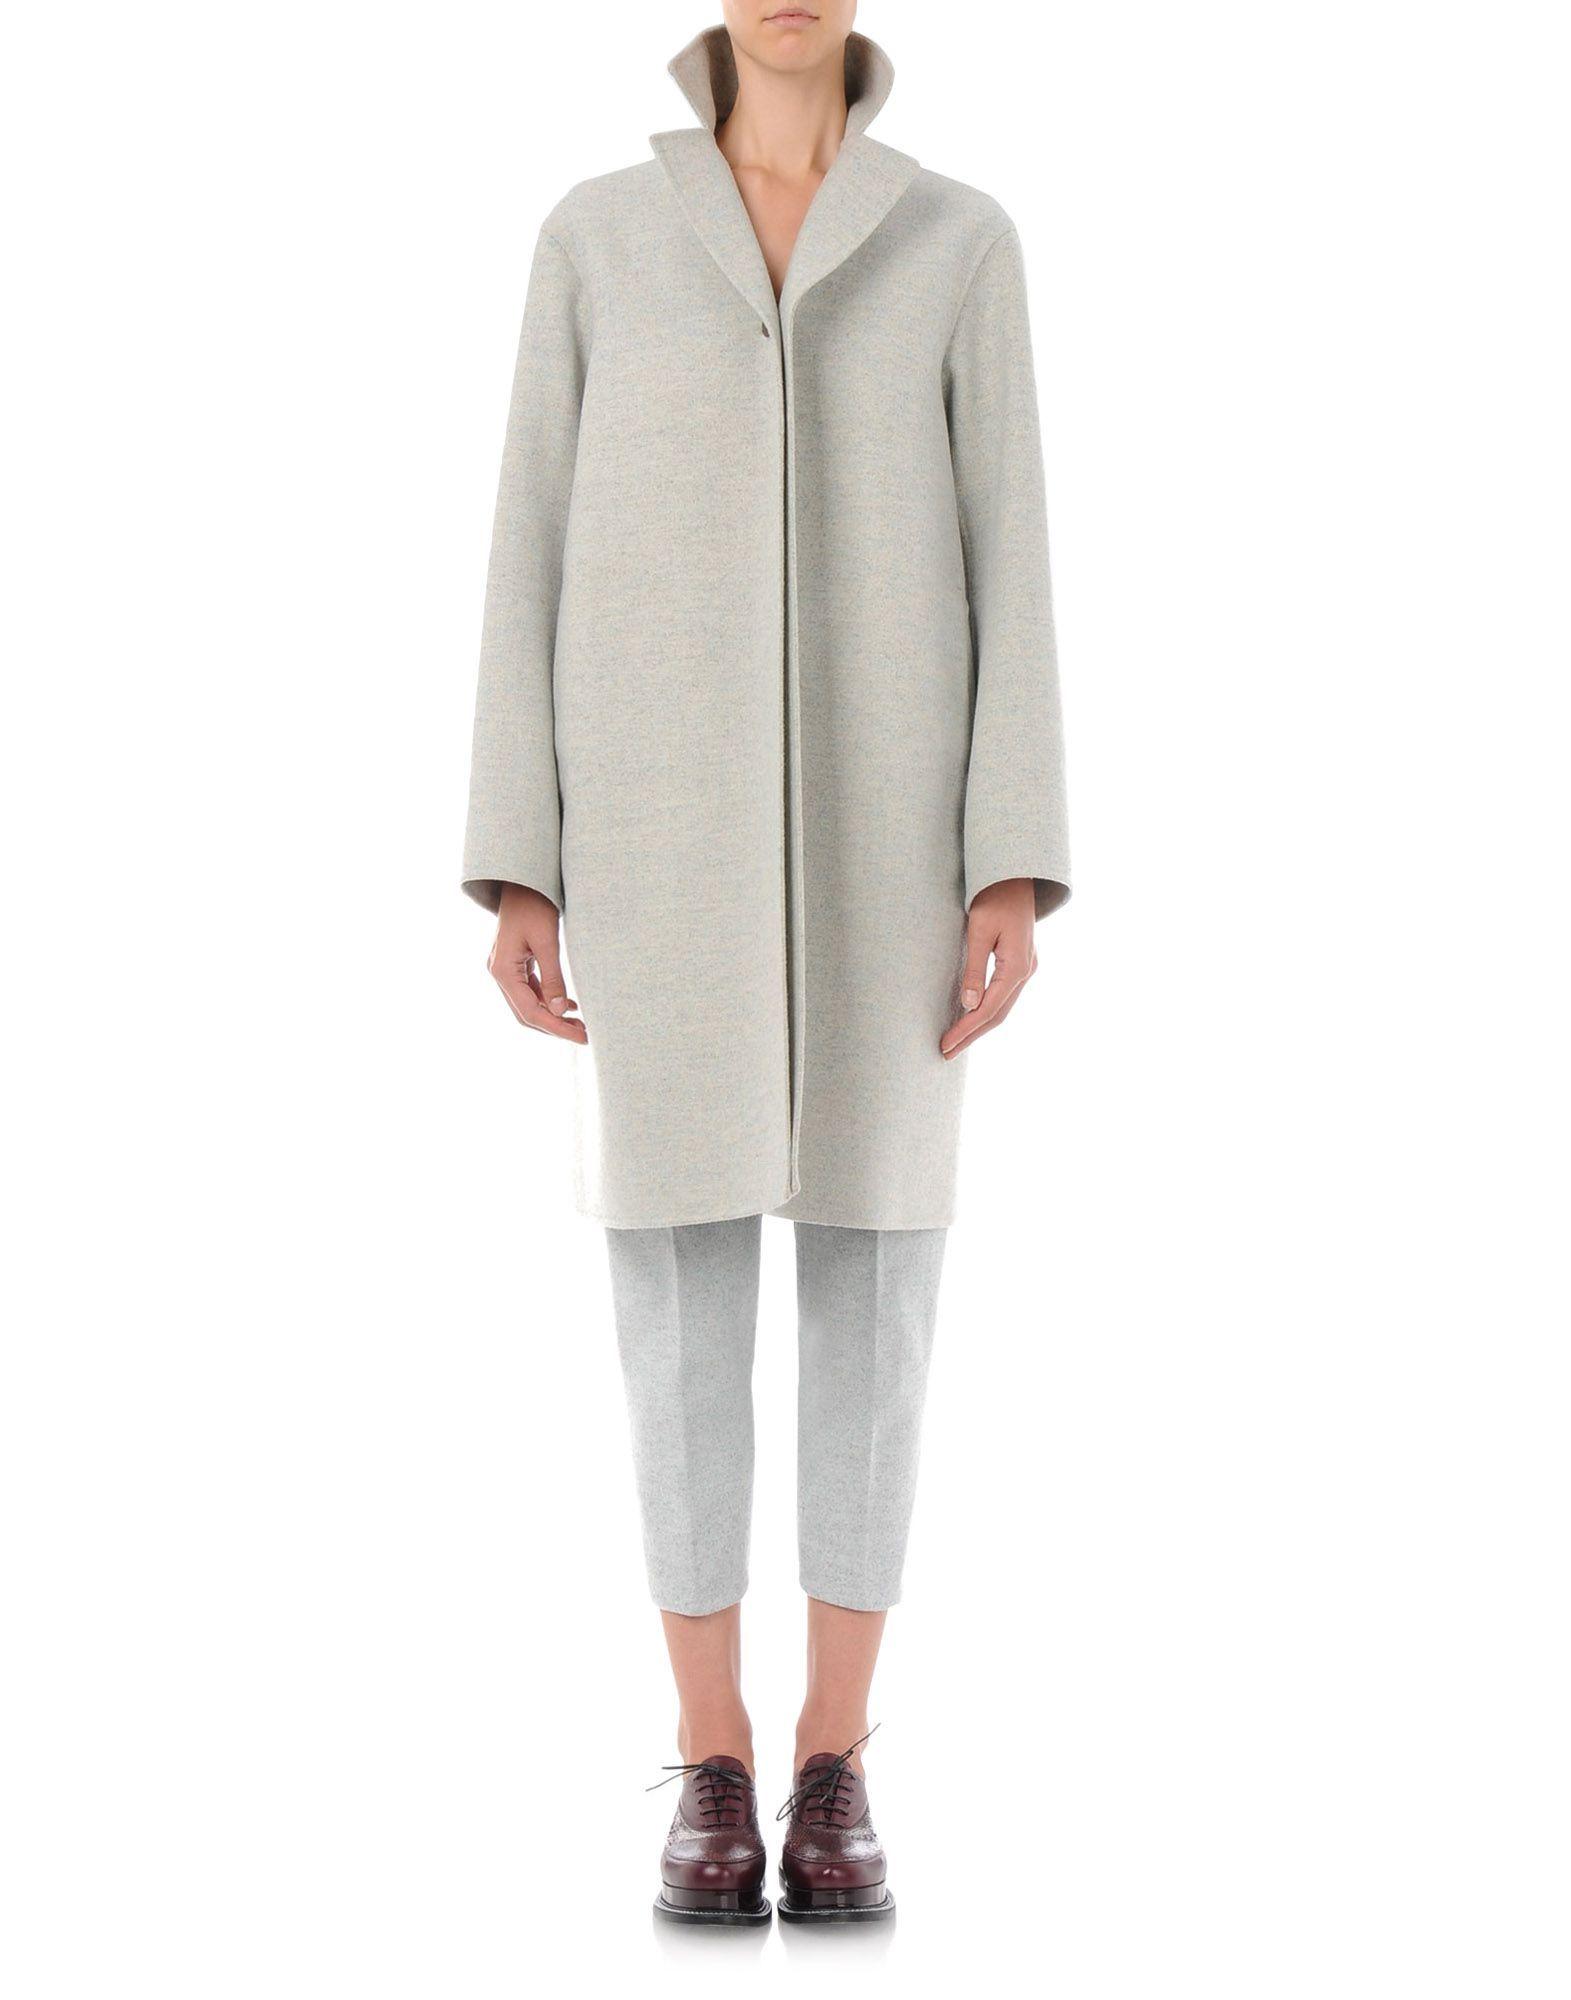 ac28a8d8f40d1 Coat Women - Coats   jackets Women on Jil Sander Online Store ...